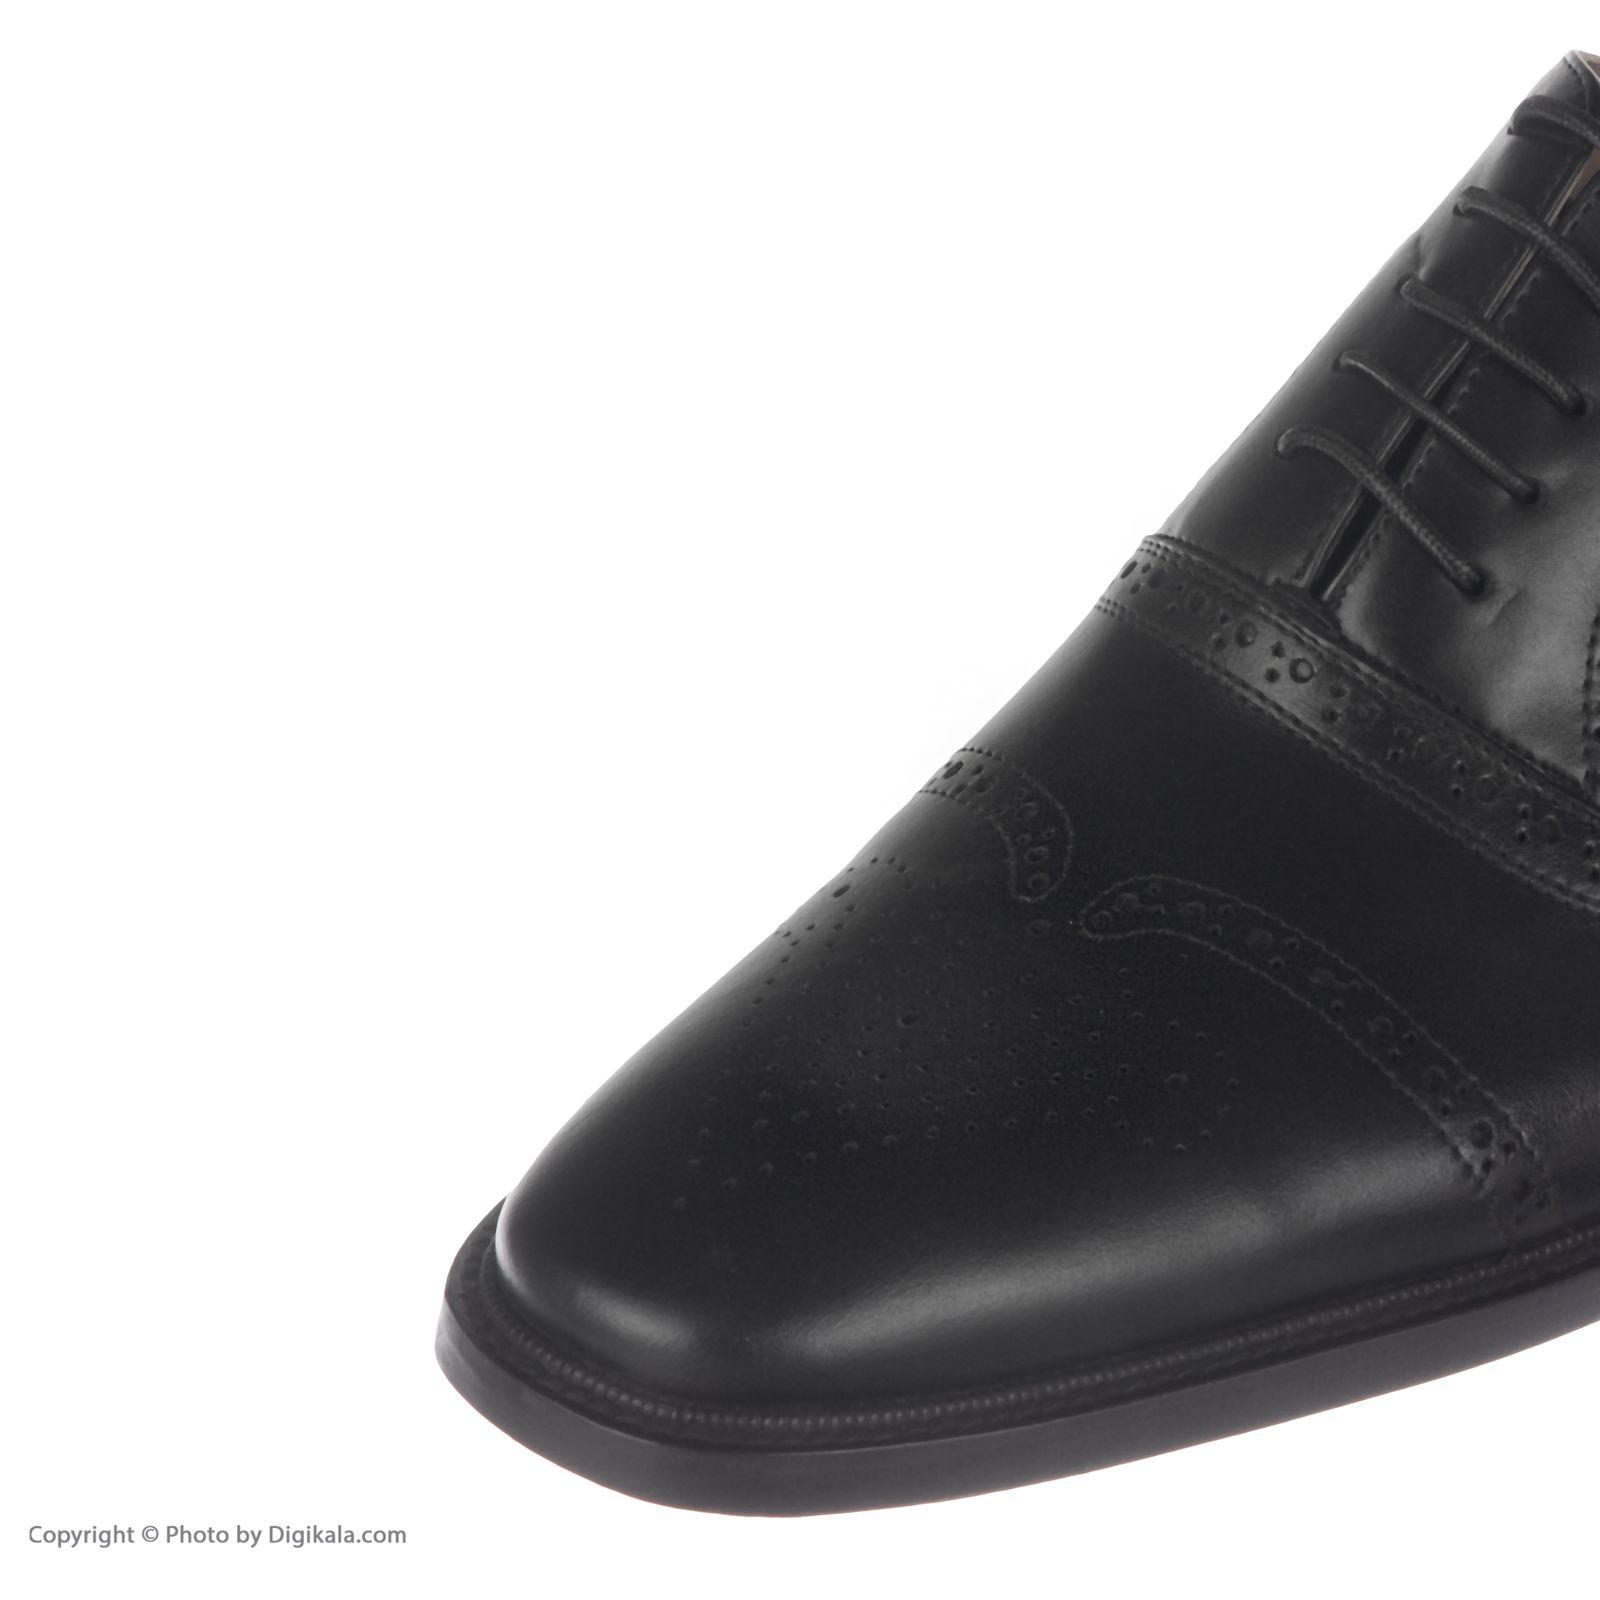 کفش مردانه نظری کد 433 -  - 6